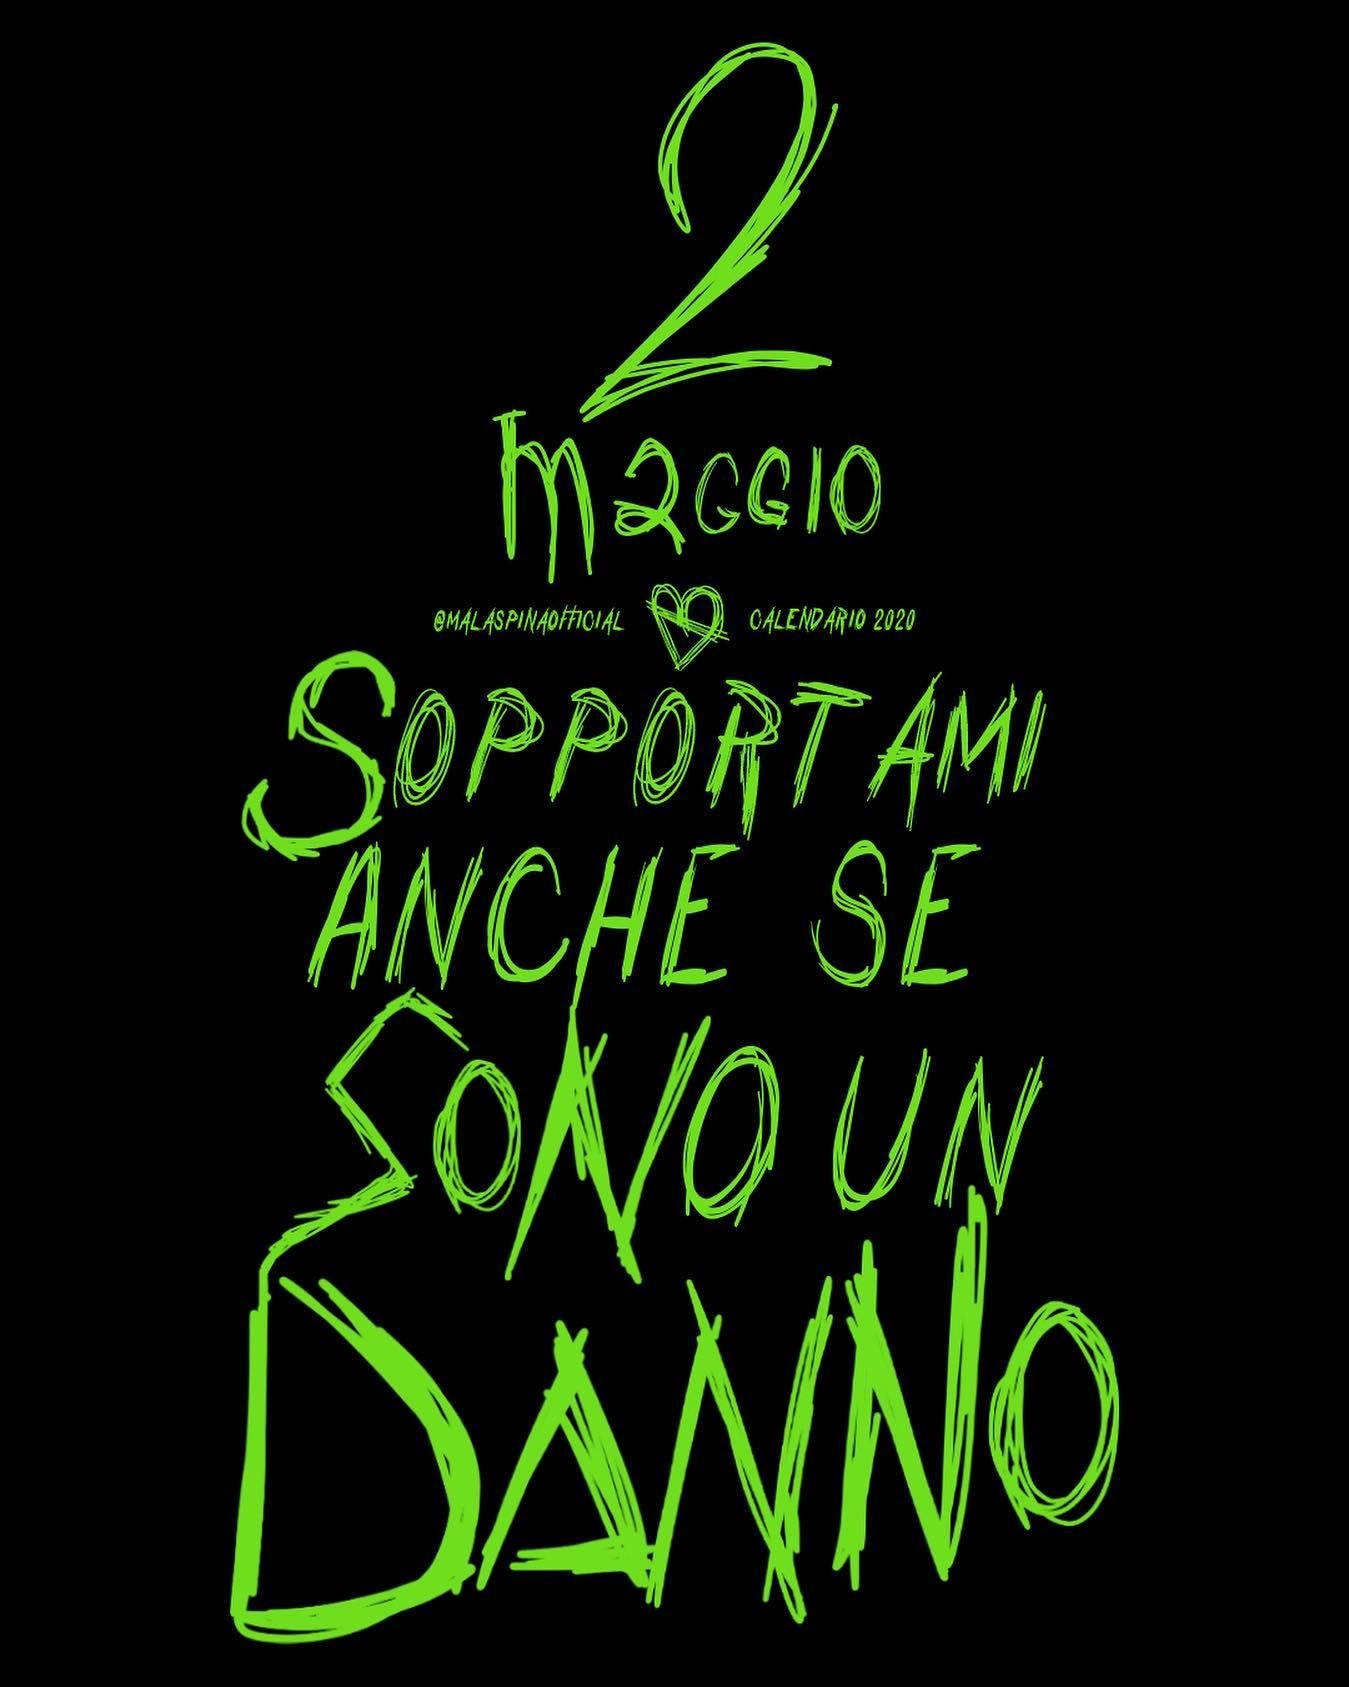 // Scrivi l'iniziale o tagga una persona importante 📍❤️ #malaspina #malaspinaofficial #essere #frasibellissime #citazioni #frasilibri #aforismi #pensieri #frasidamore #aesthetic #frasi #frasitop #frasibelle #frasitumblr #frasivere #frasiitaliane #frasisignificative #felicità #pensiero #vita #amore #tiamo #tumblrgirl #tumblr #frasiitaliane #mimanchi #amicizia #netflix